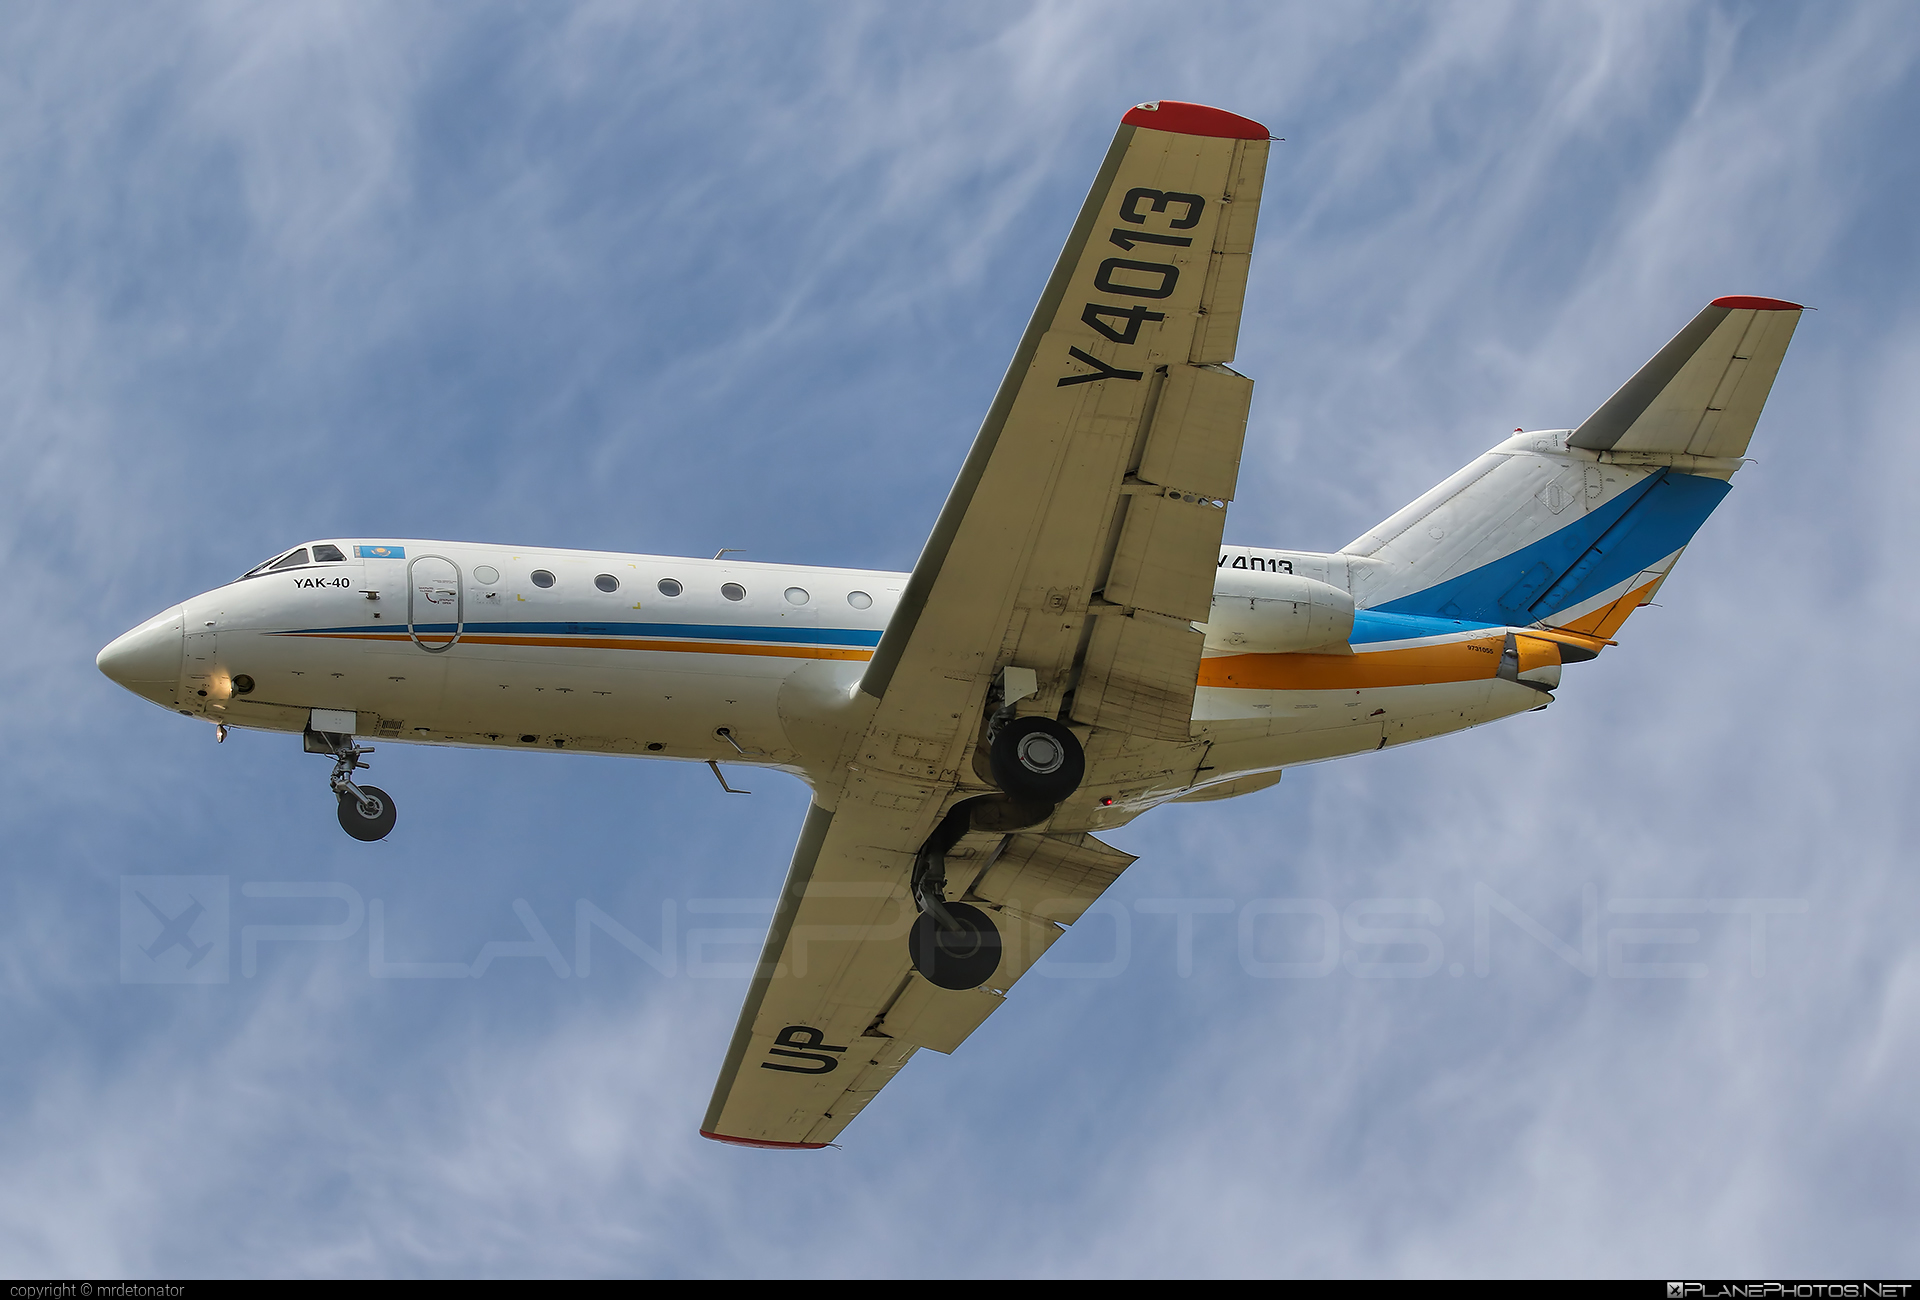 Yakovlev Yak-40 - UP-Y4013 operated by Kazakhstan - Government #yak #yak40 #yakovlev